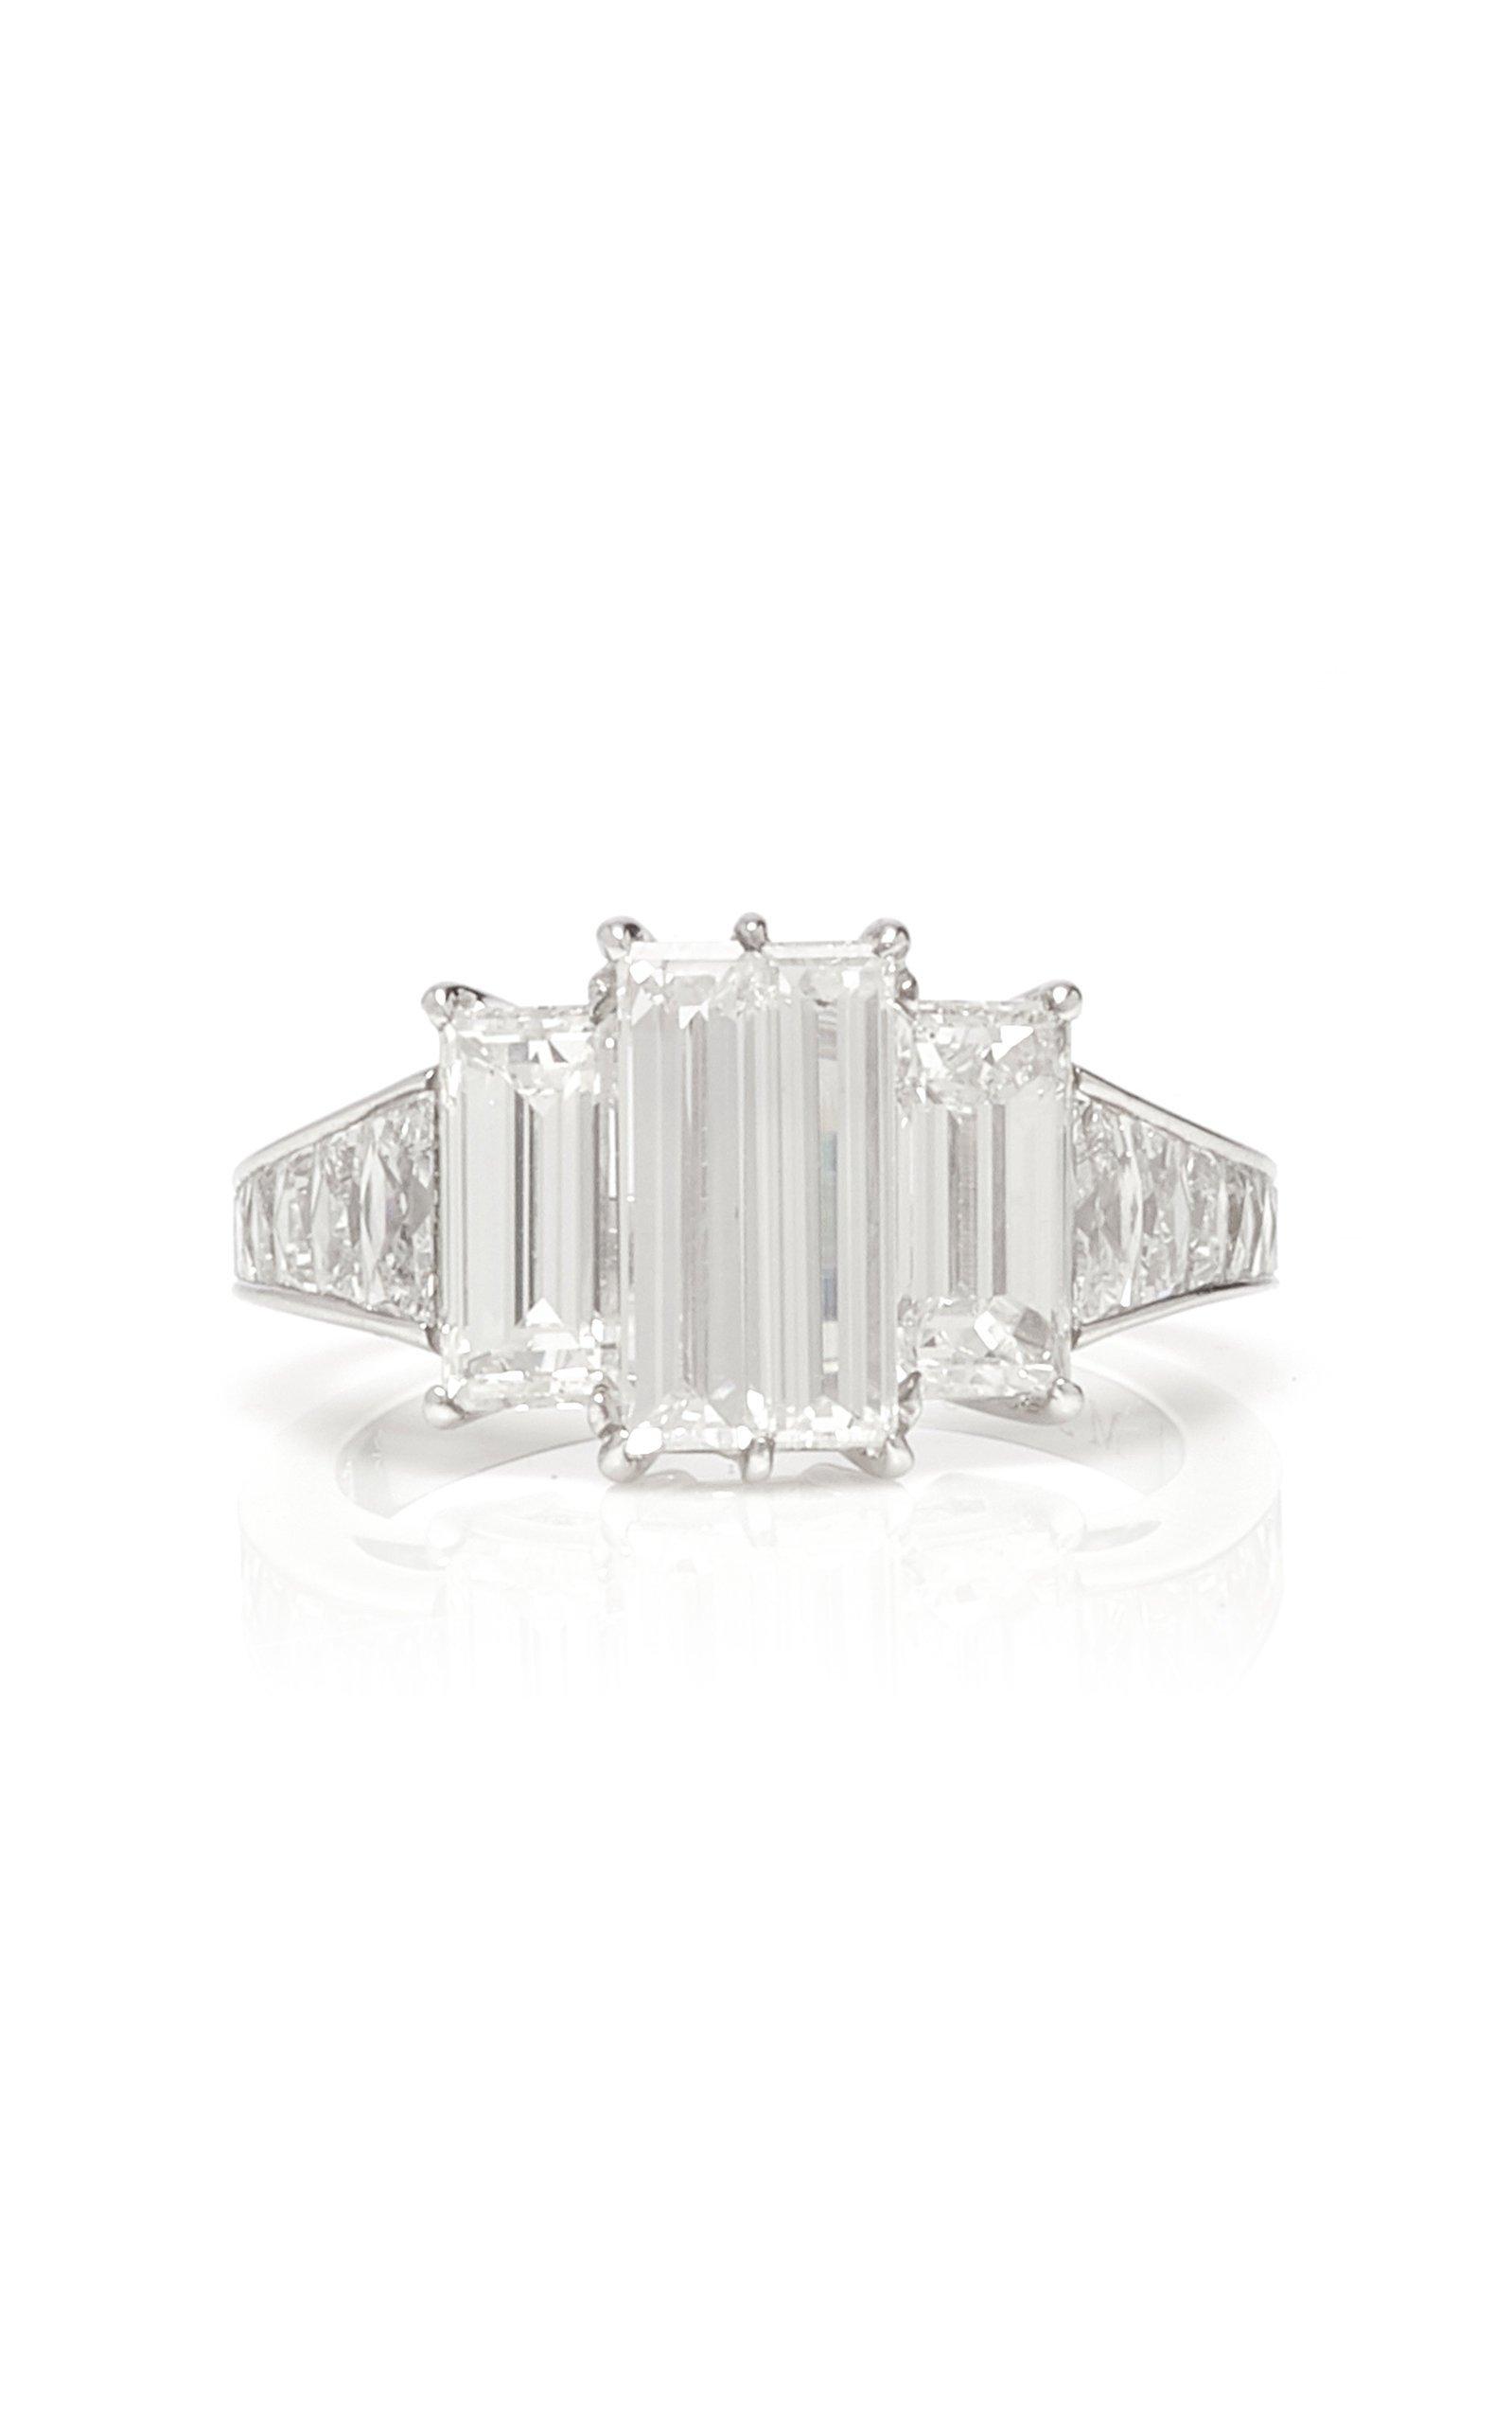 Martin Katz 4-Stone Baguette Diamond Ring